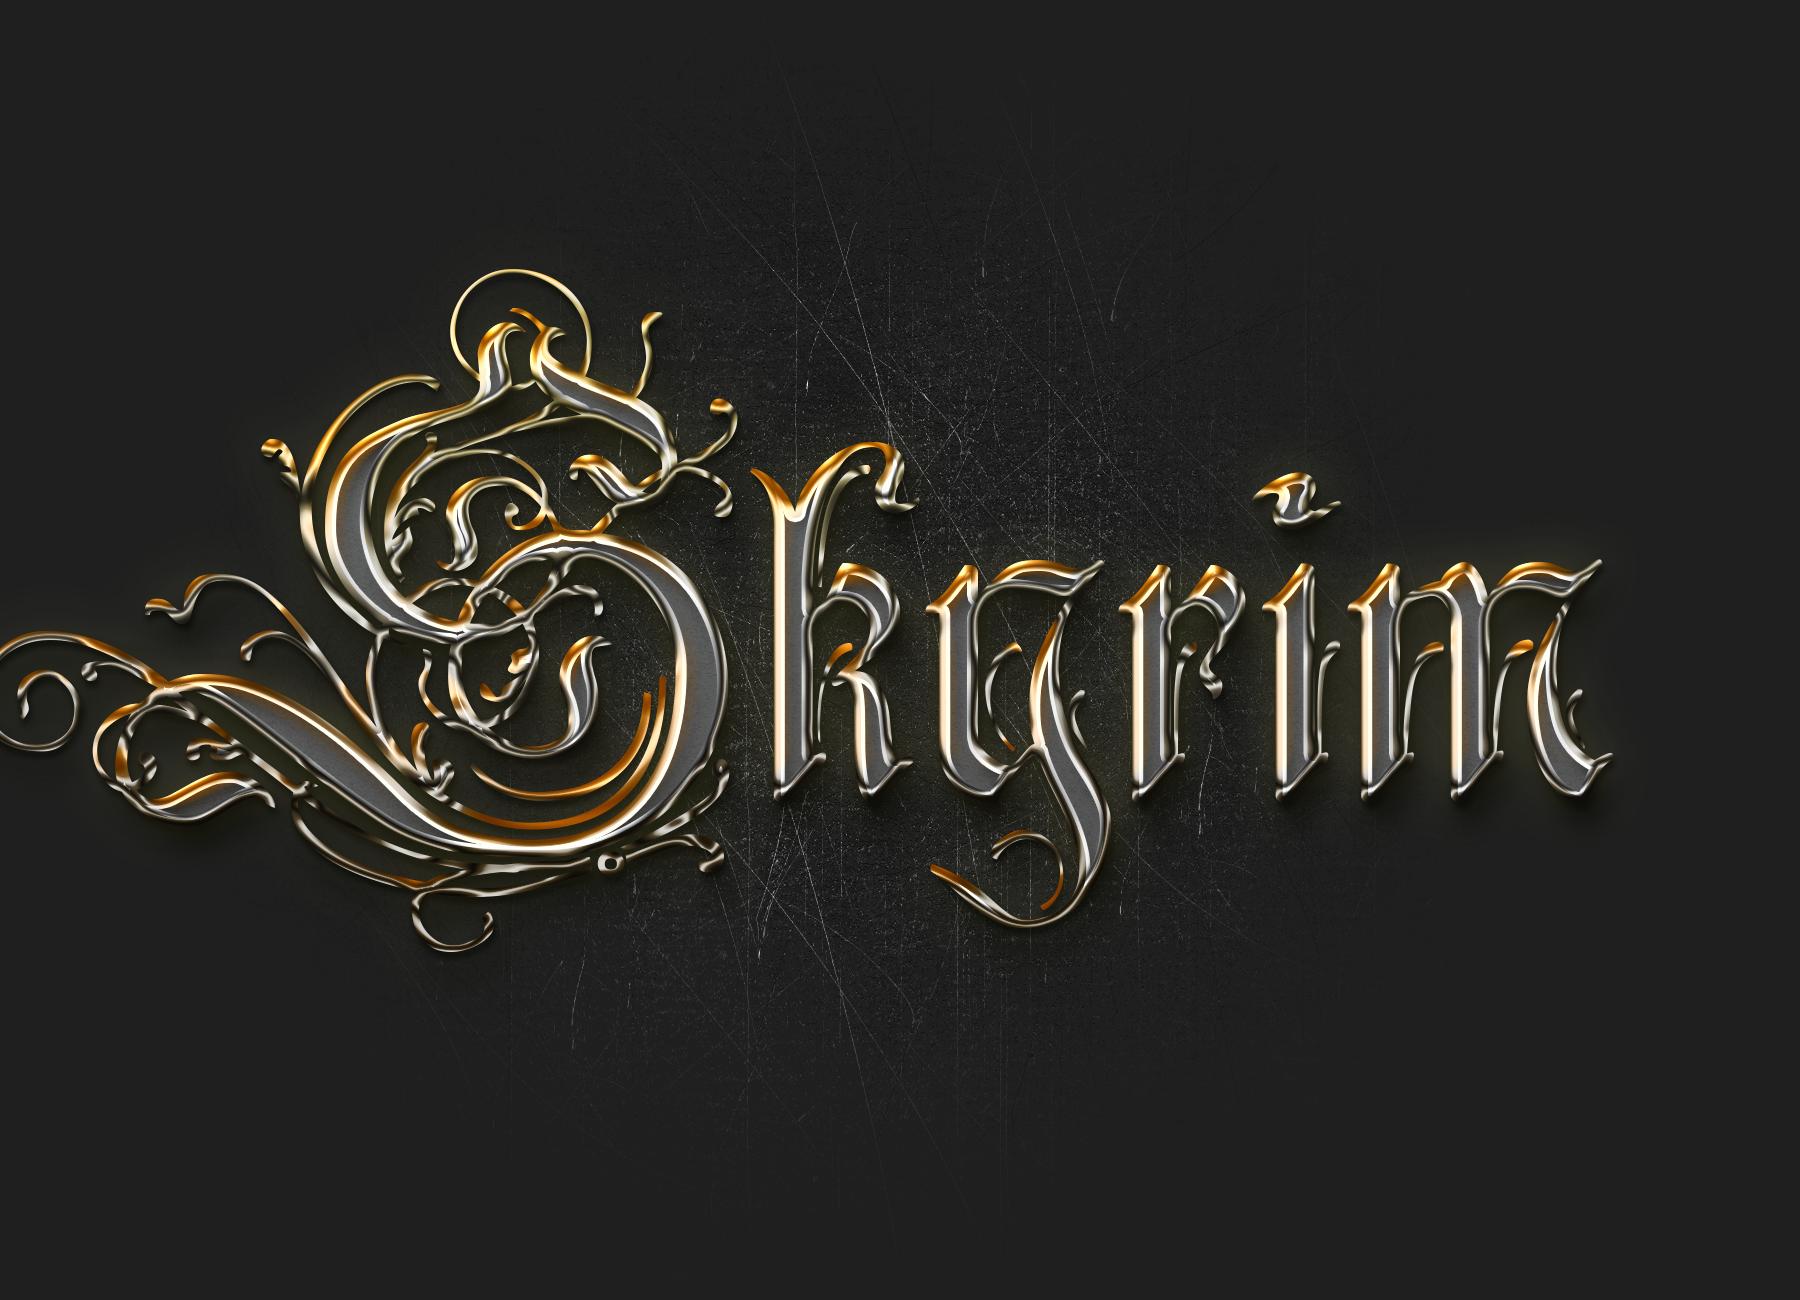 Metal Font Skyrim By Replayyalper On Deviantart